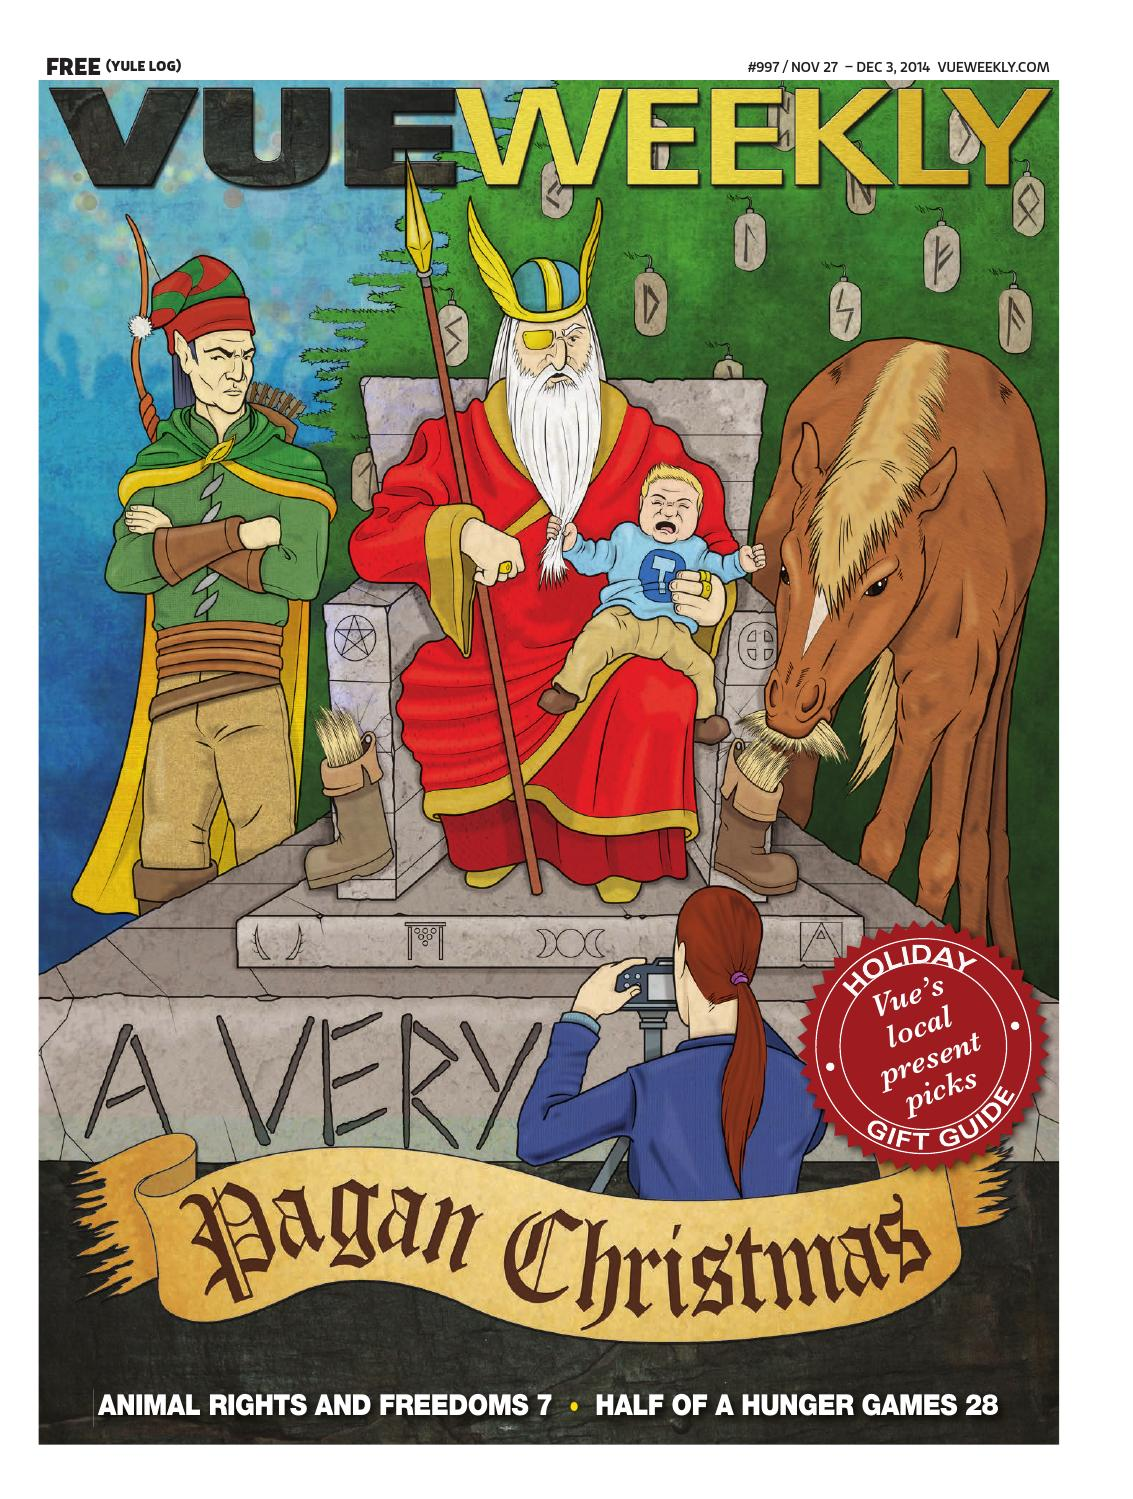 Abarra Miller Porno 997: a very pagan christmasvue weekly - issuu